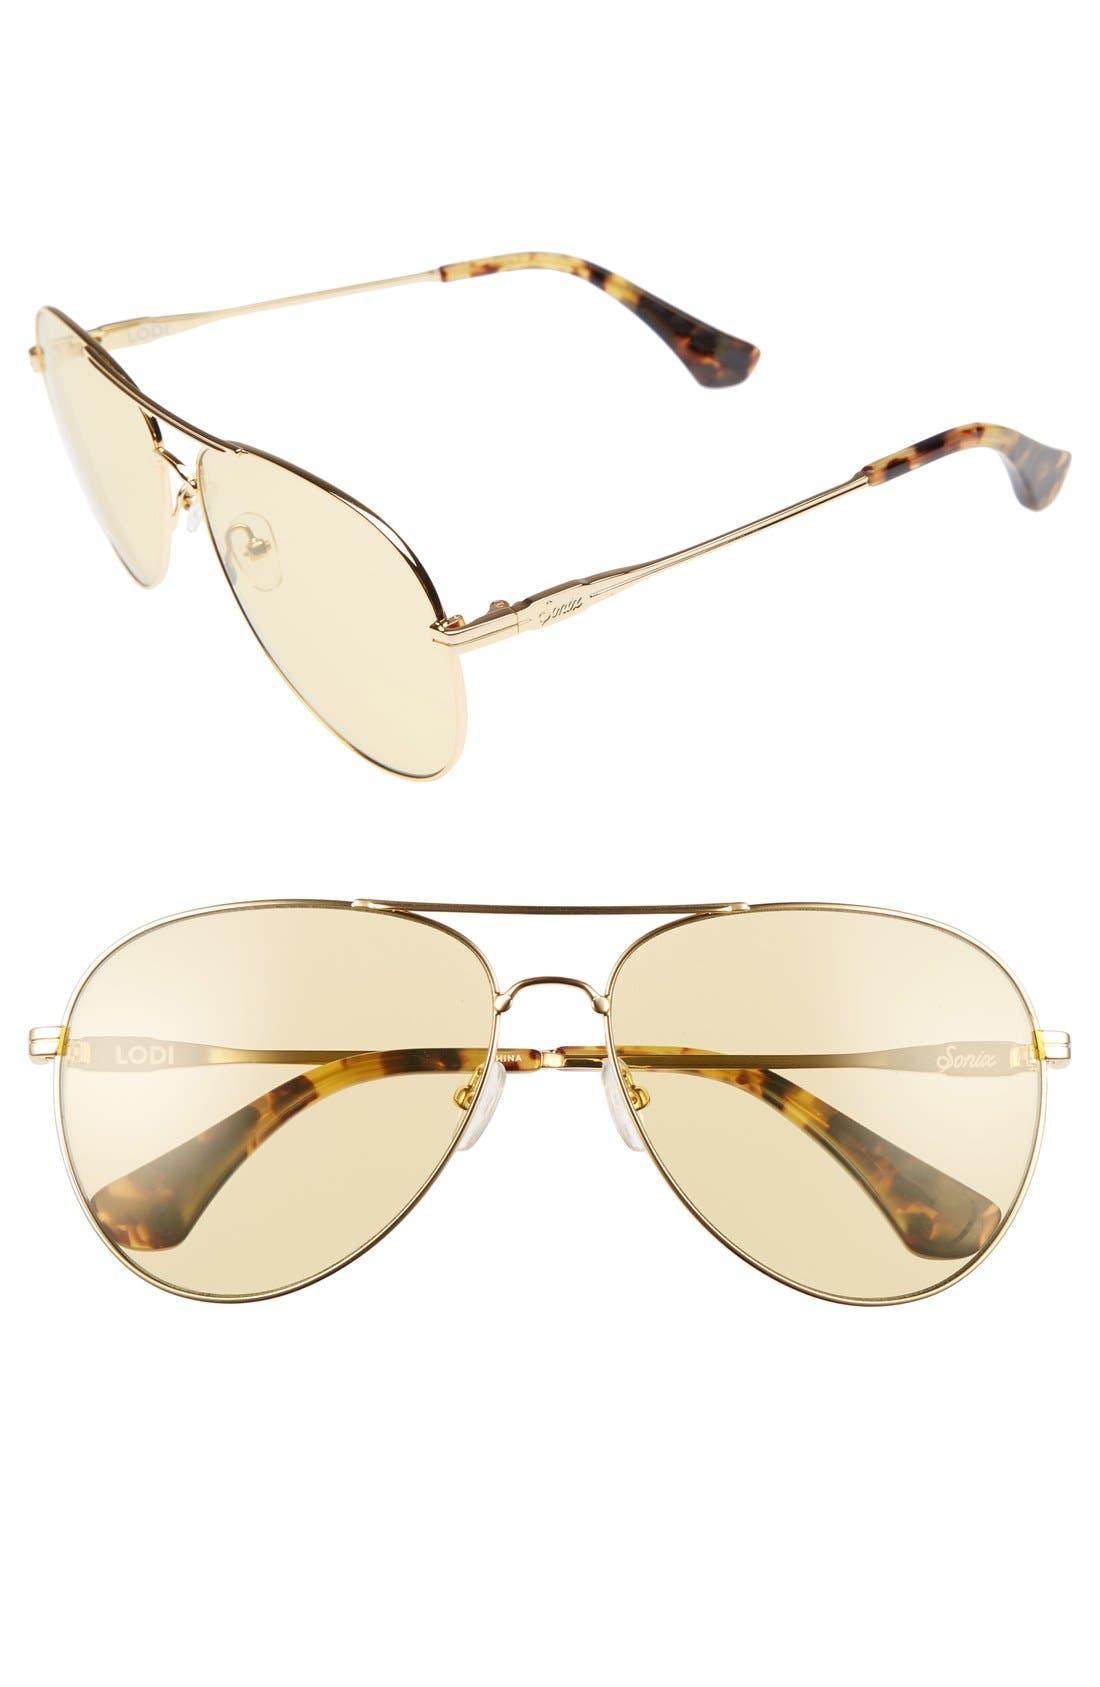 Lodi 62mm Mirrored Aviator Sunglasses,                             Main thumbnail 4, color,